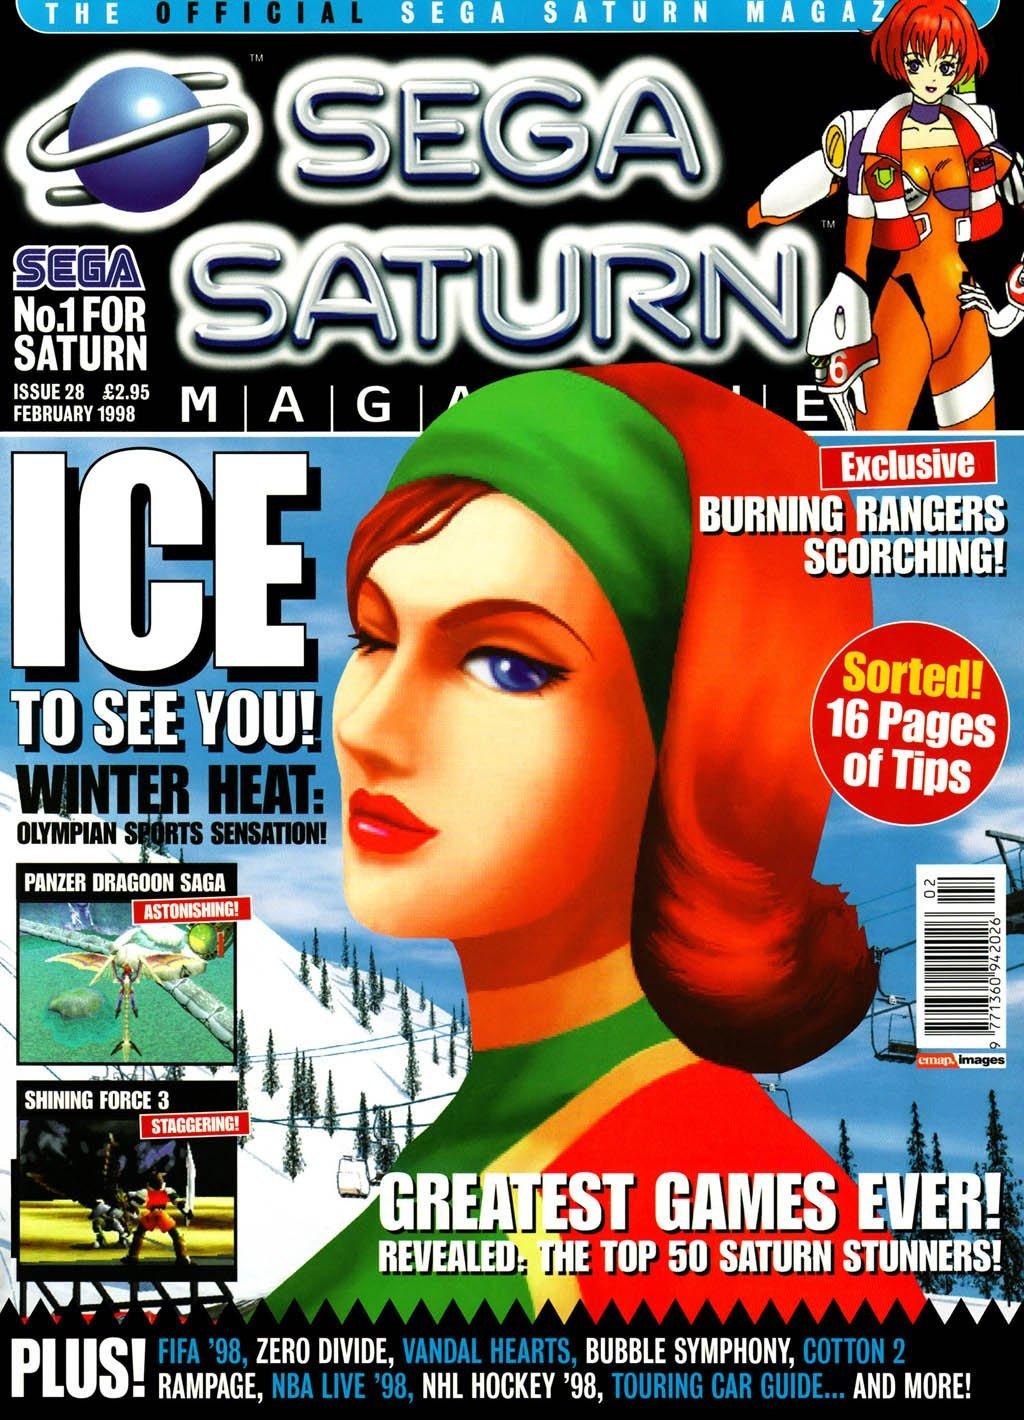 Official Sega Saturn Magazine 28 (February 1998)